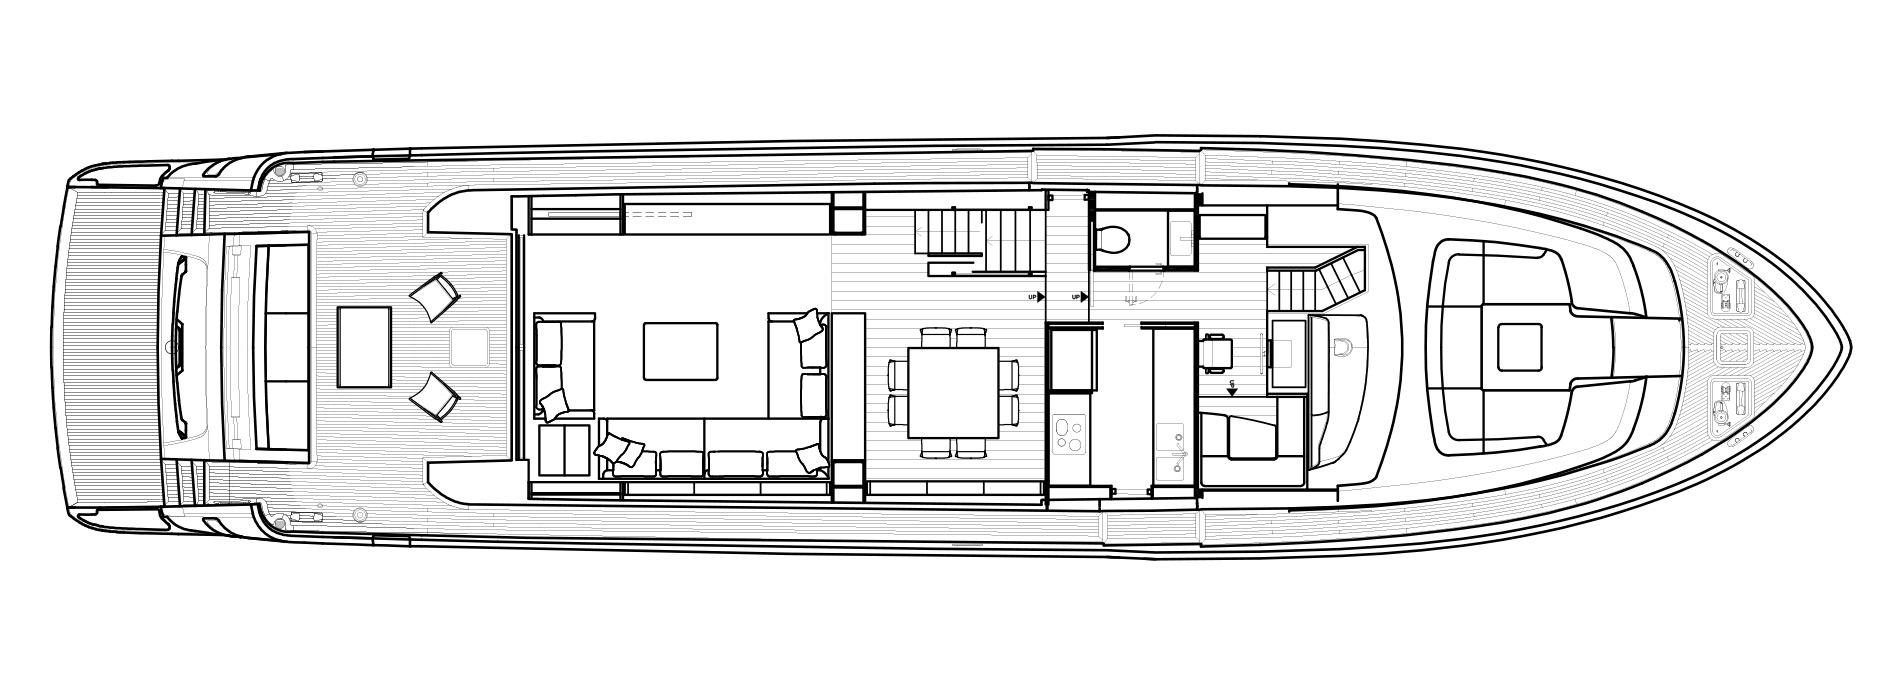 Sanlorenzo Yachts SL86/698 Главная палуба версия A